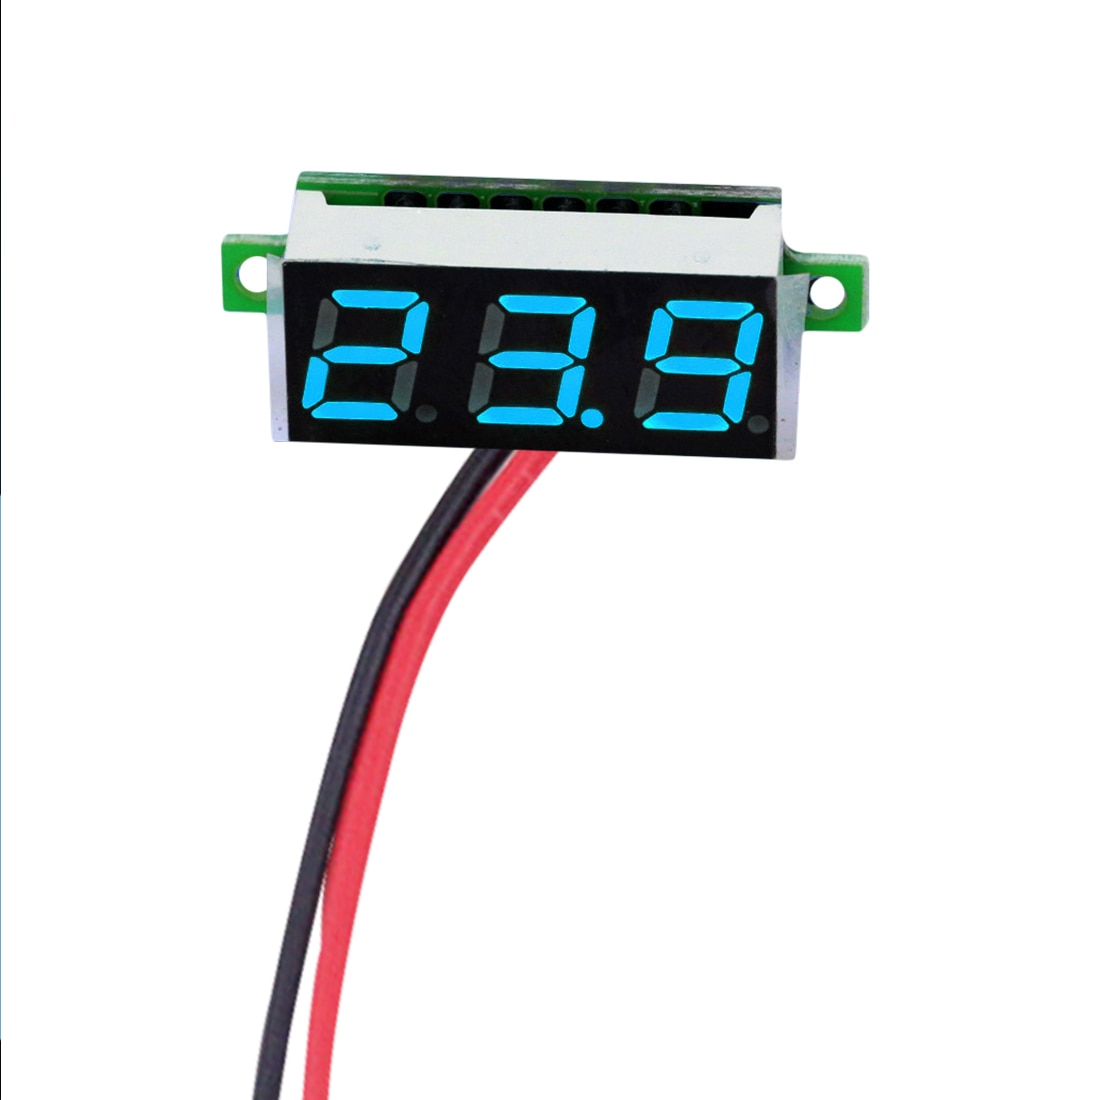 Mini voltímetro Digital medidor de voltaje 0,28 pulgadas 2,5 V-30V pantalla LED partes electrónicas accesorios voltímetro Digital